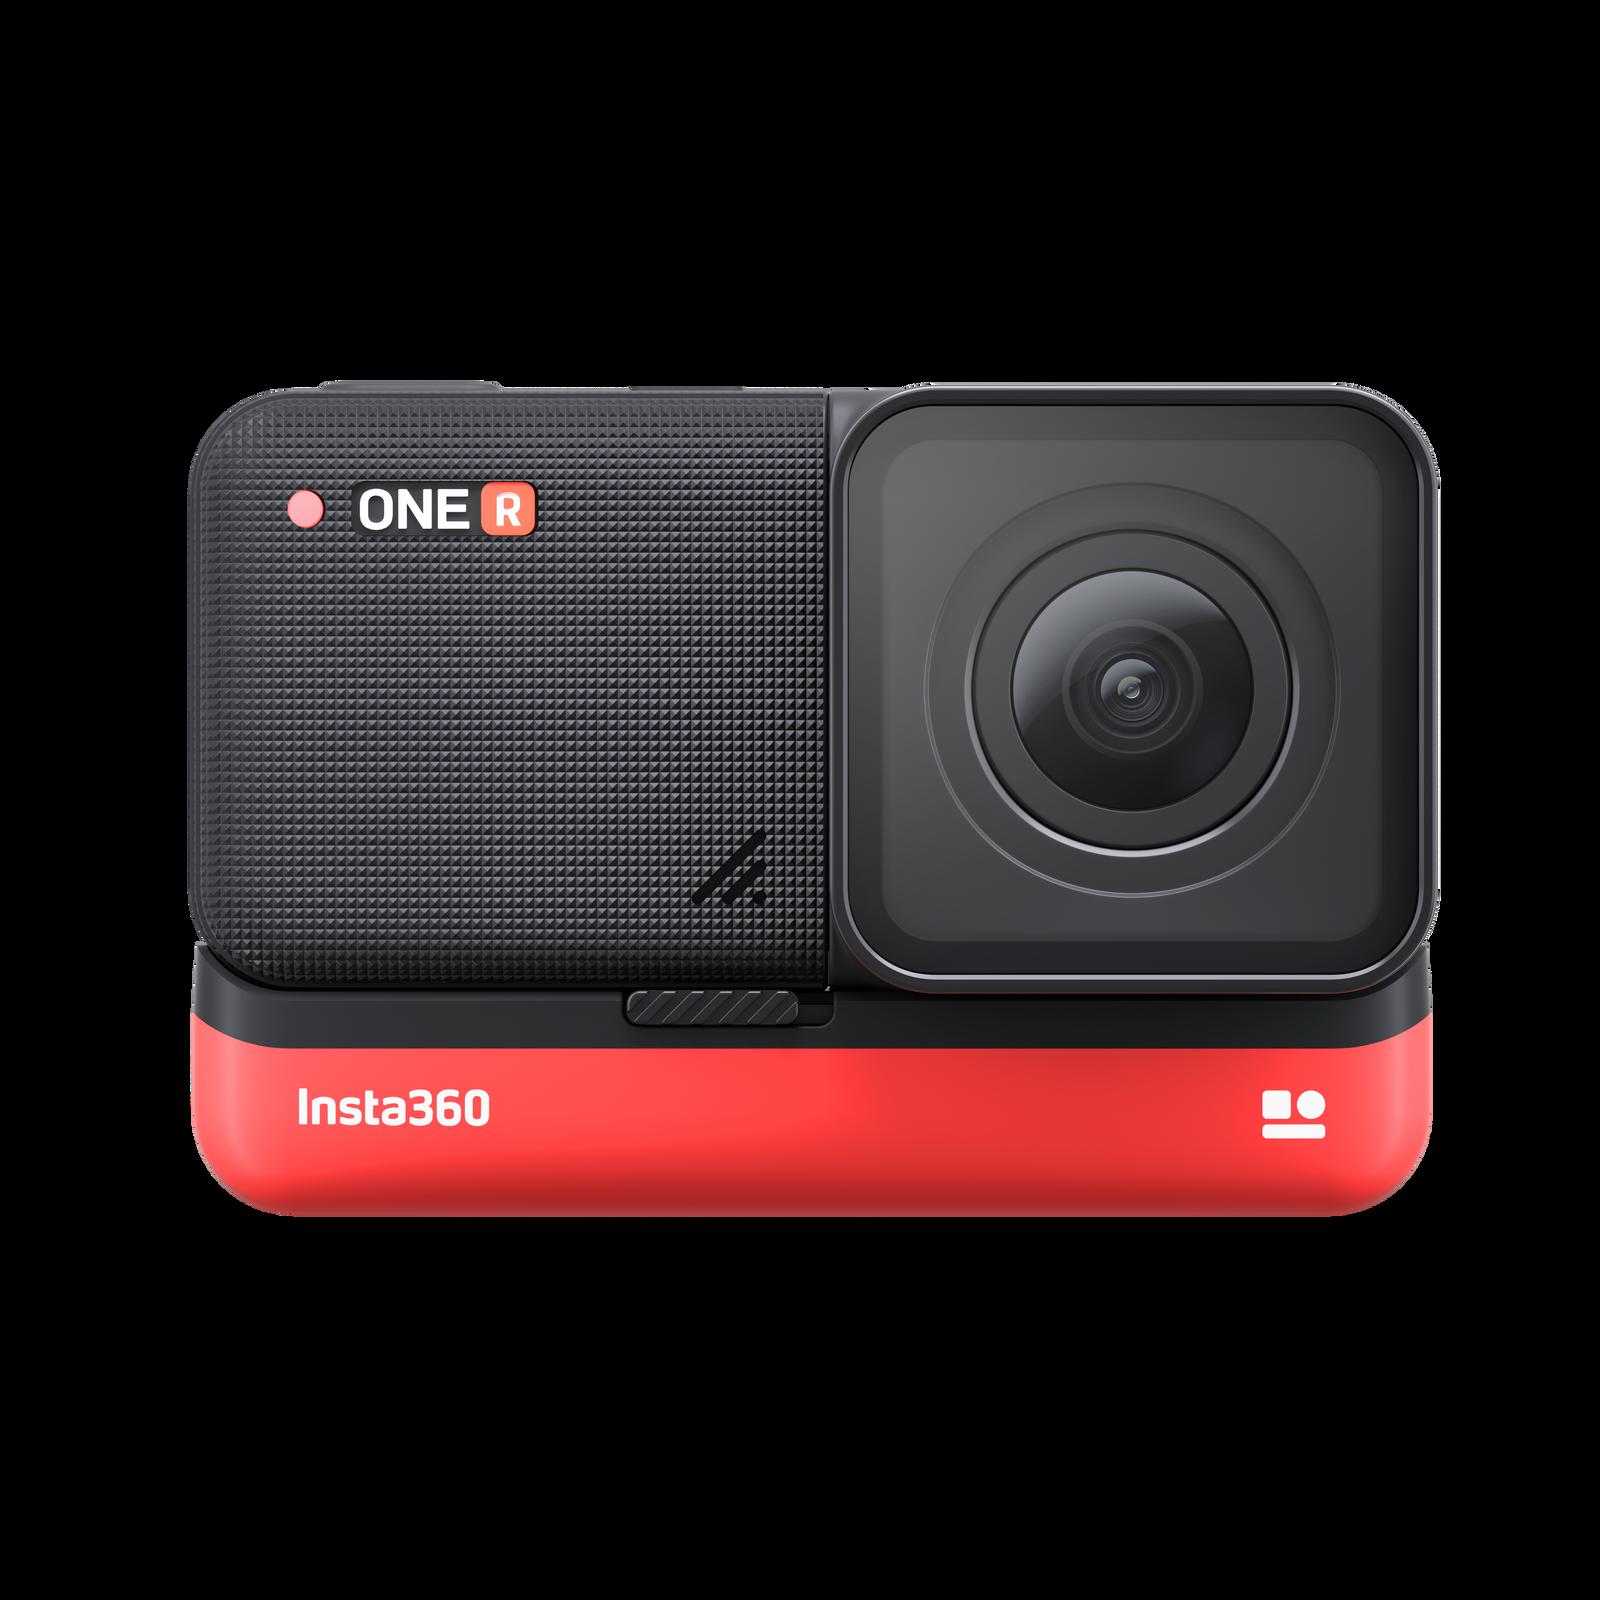 Insta360-ONE R - 4K camera mounted